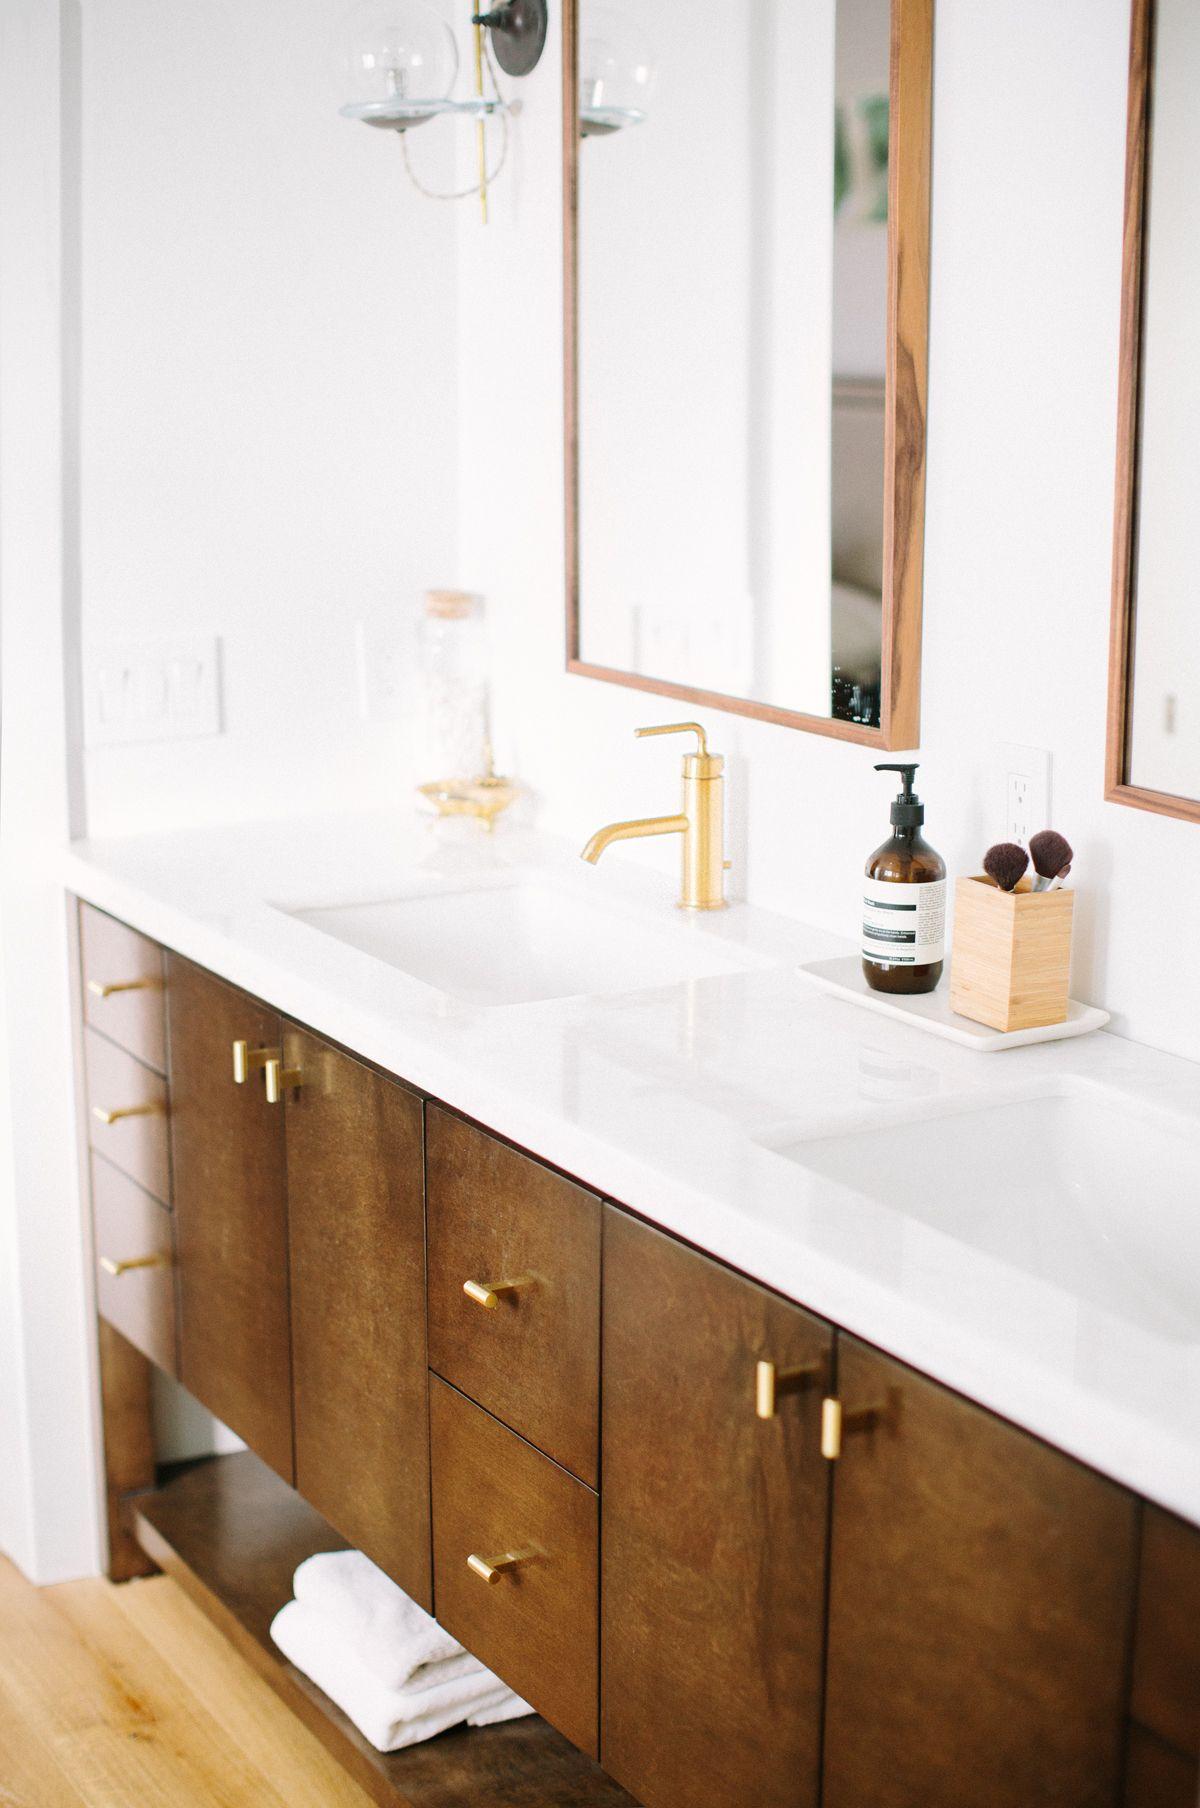 Custom Mid Century Modern Wood Bathroom Vanity Designed By Carly